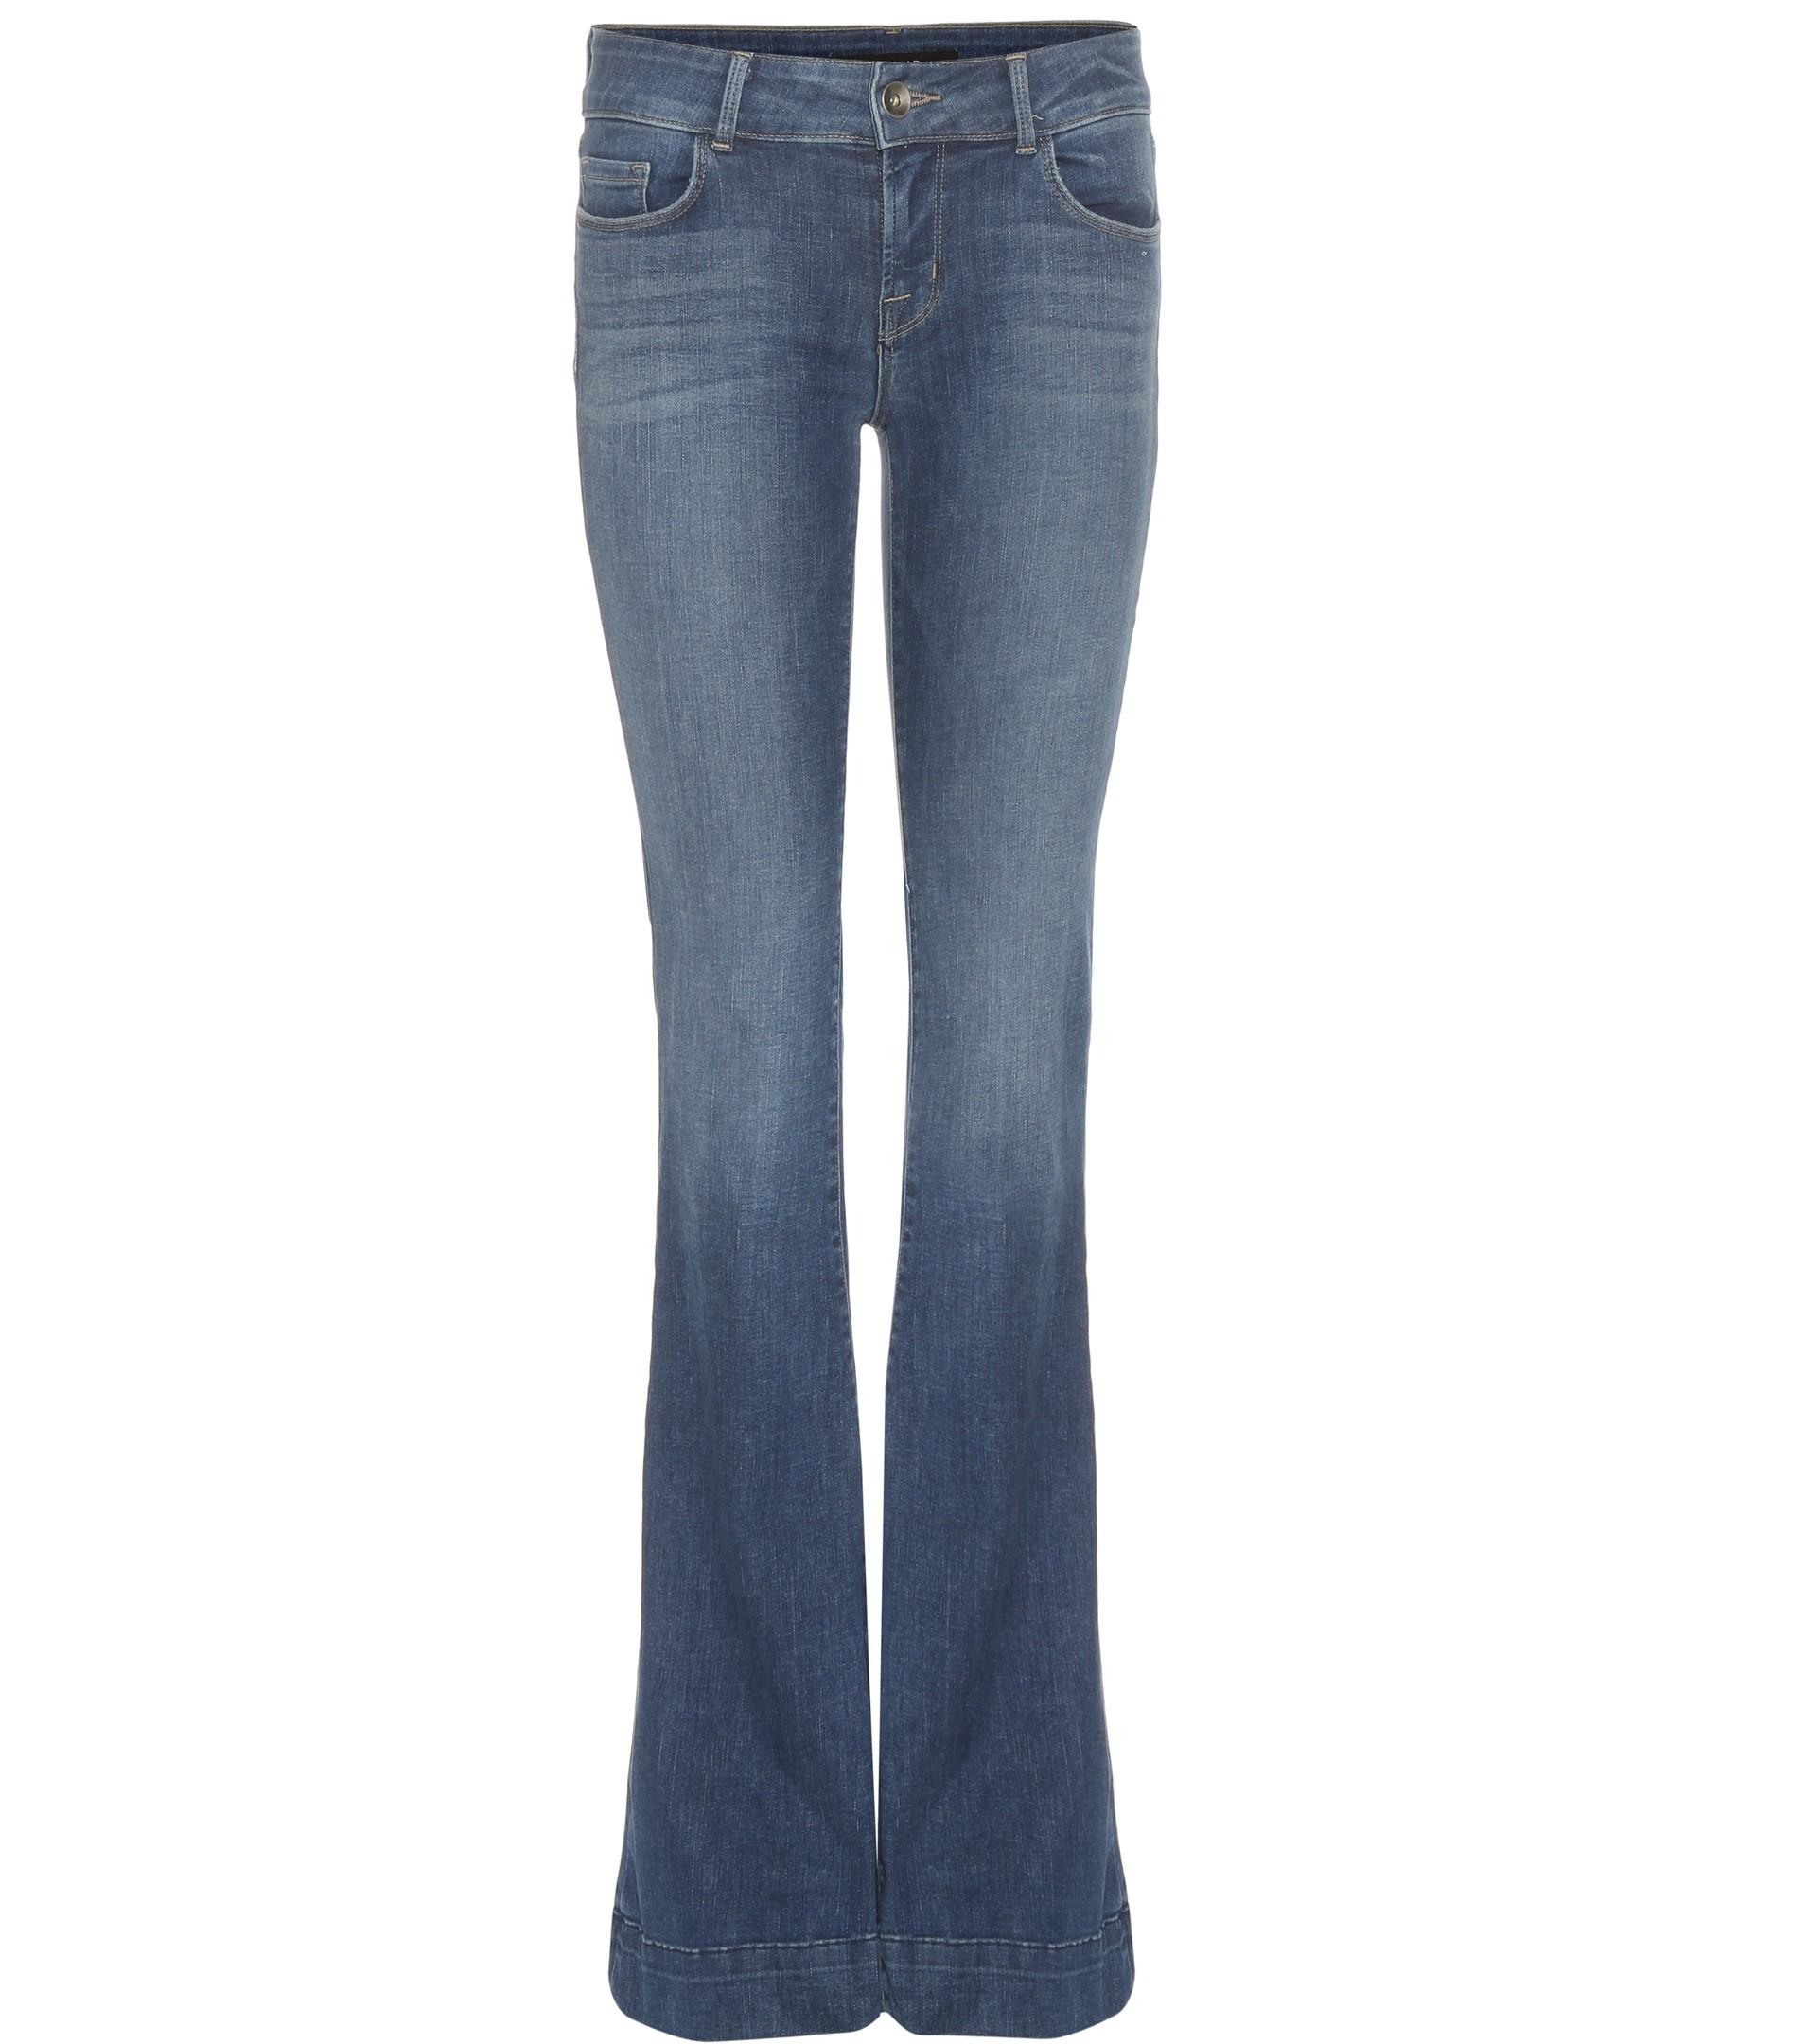 j brand the lovestory flared jeans in blue lyst. Black Bedroom Furniture Sets. Home Design Ideas